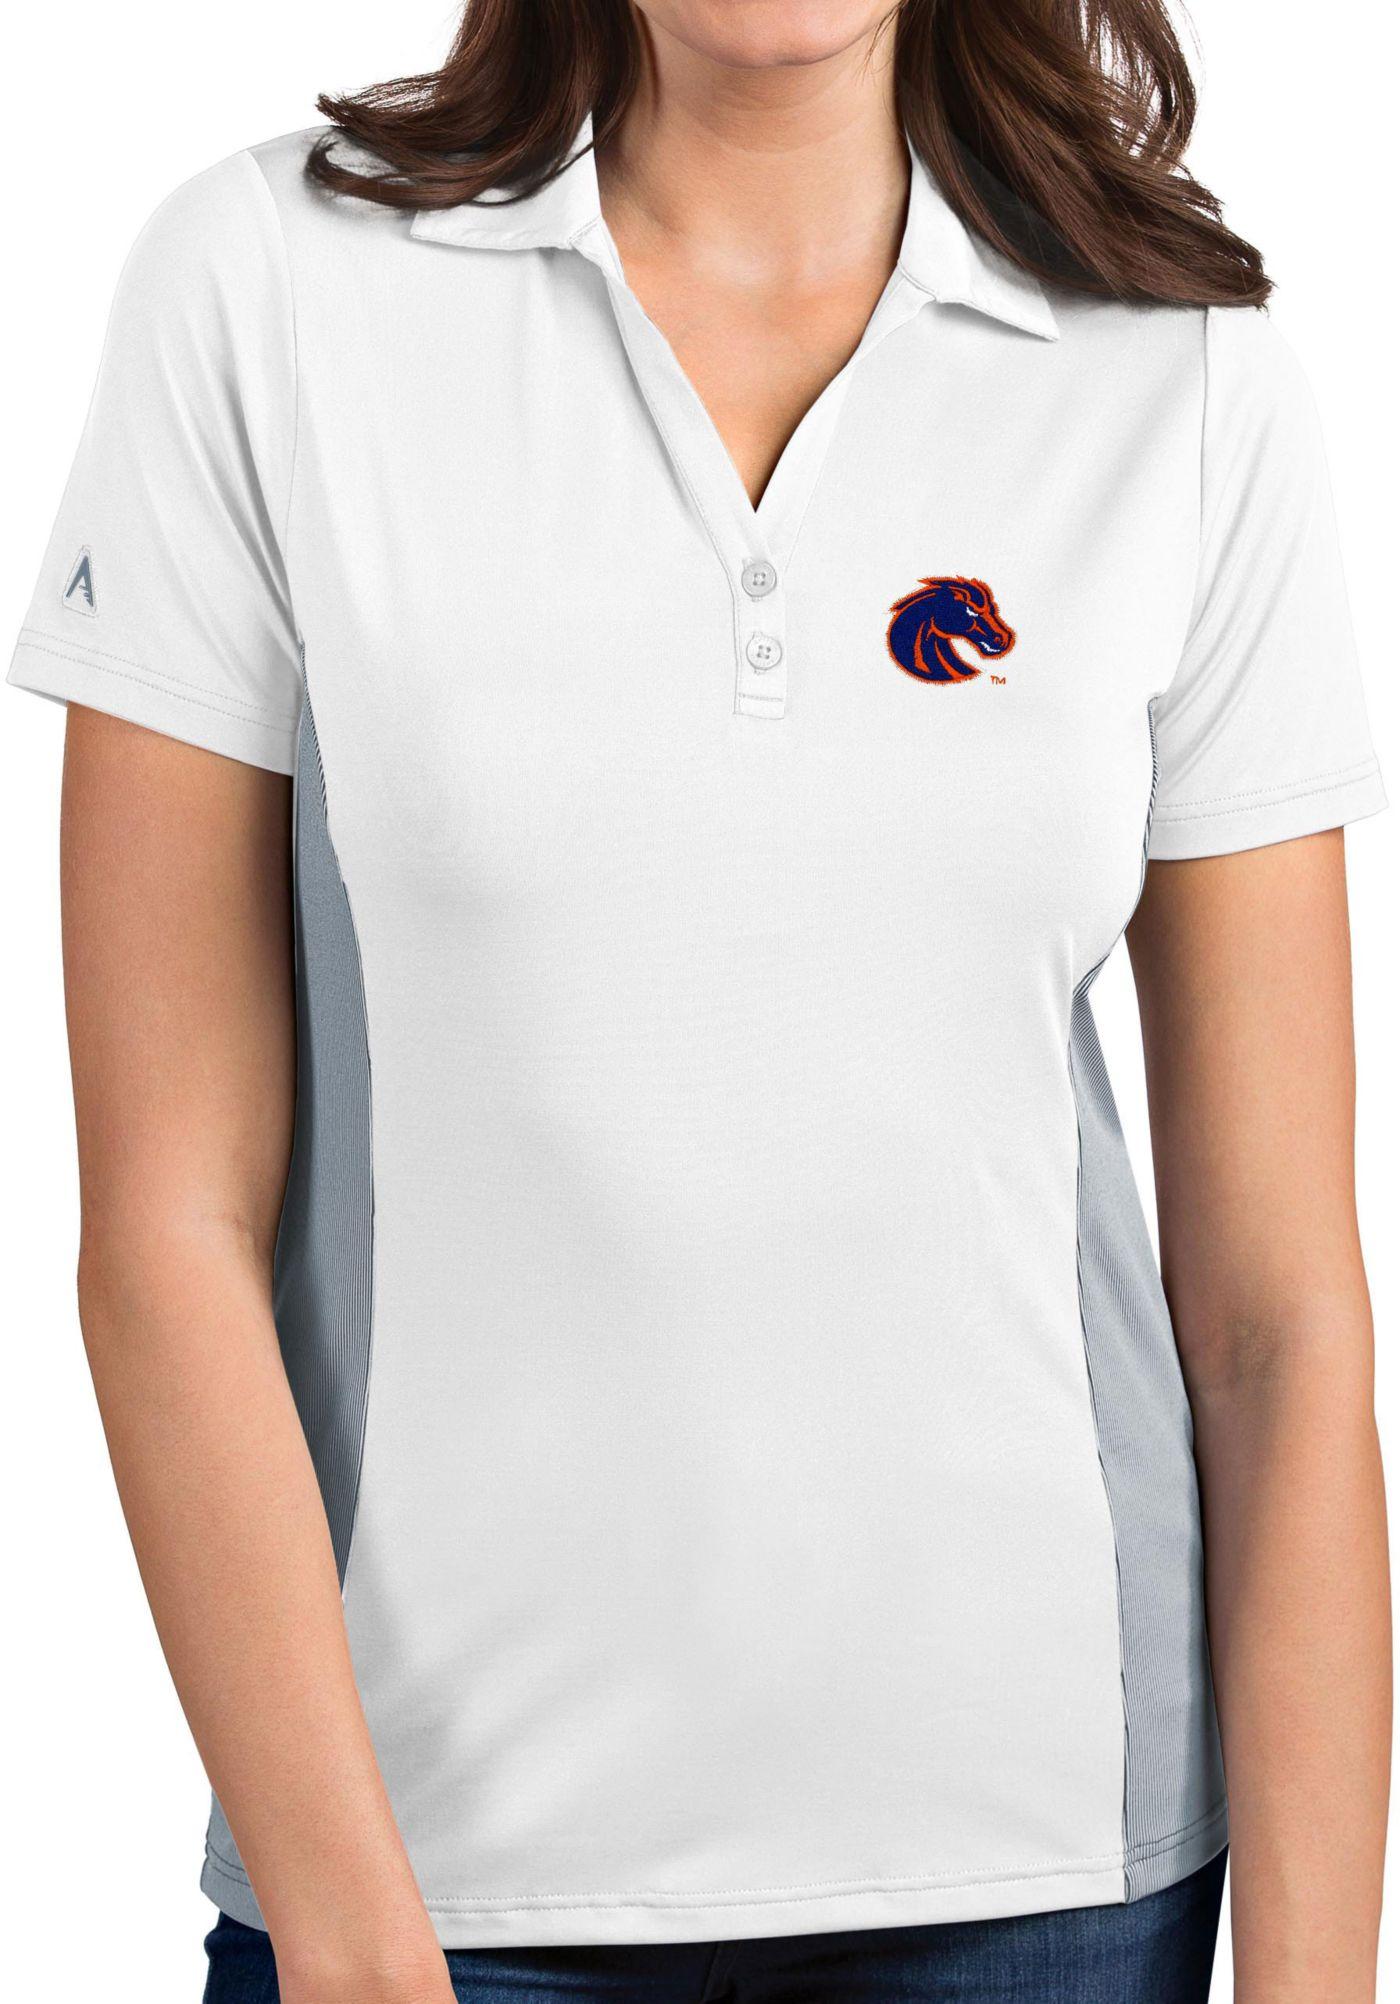 Antigua Women's Boise State Broncos Venture White Polo